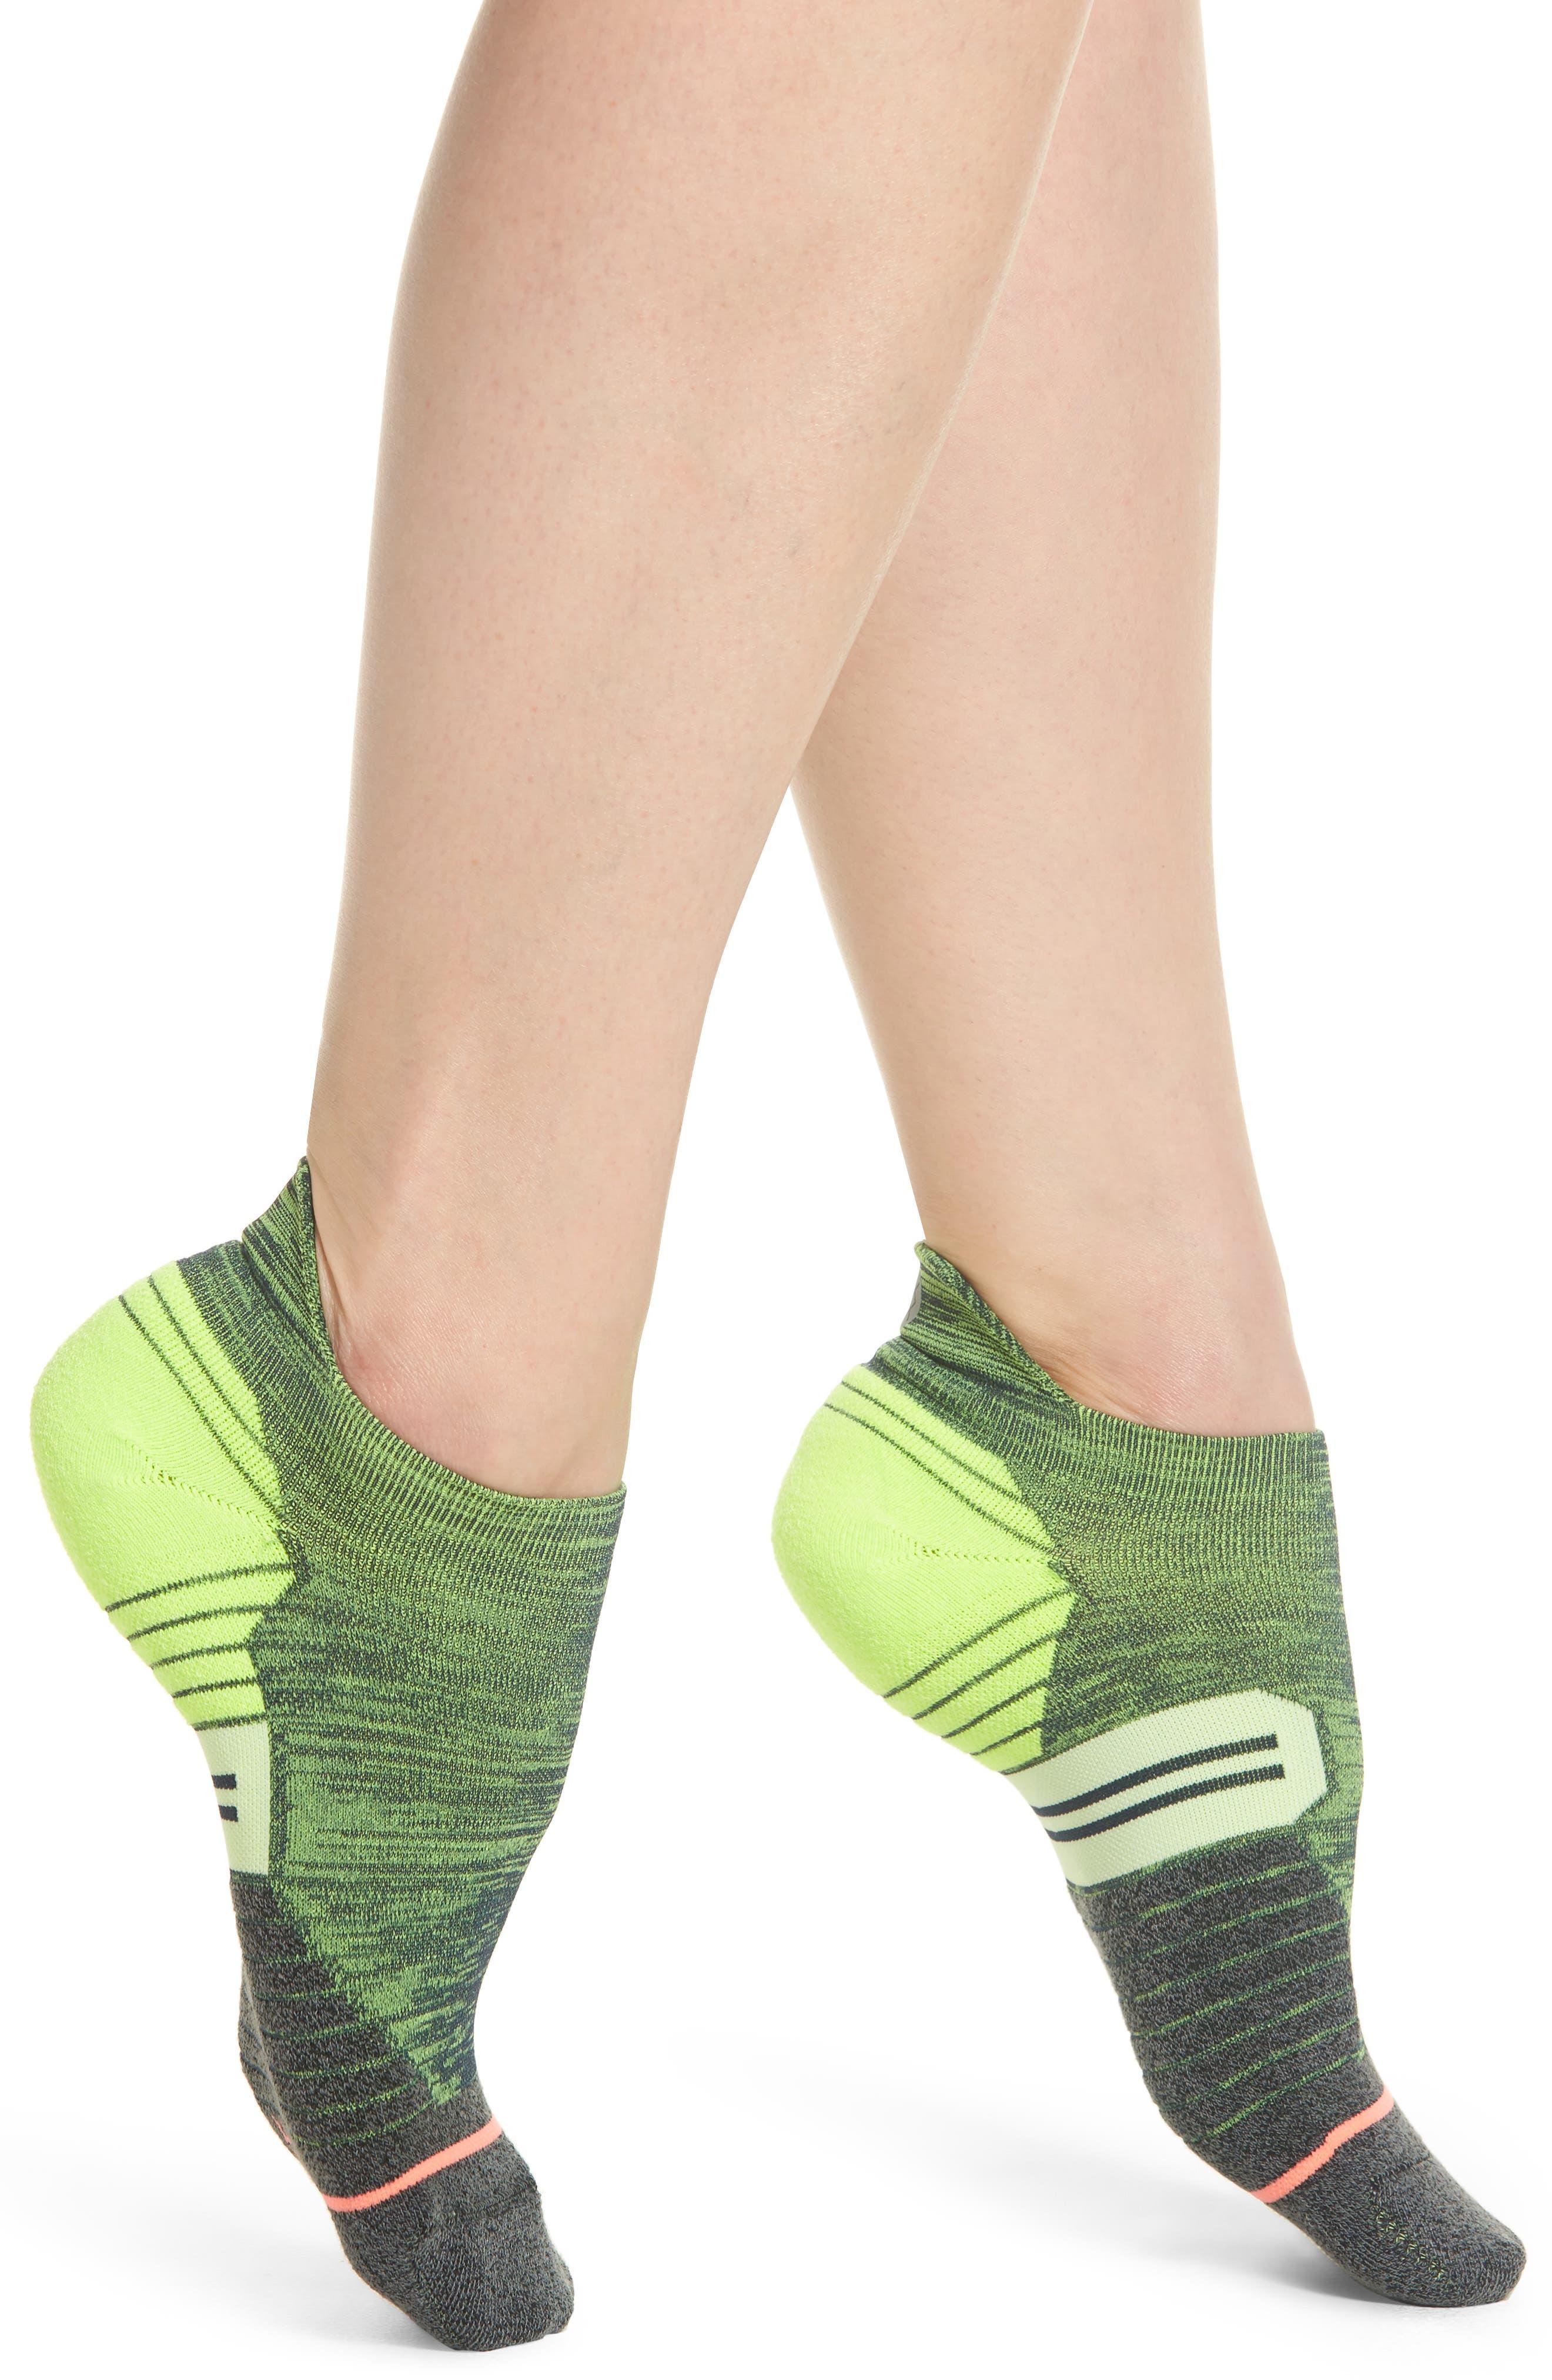 Distance Tab Running Socks,                         Main,                         color, 300